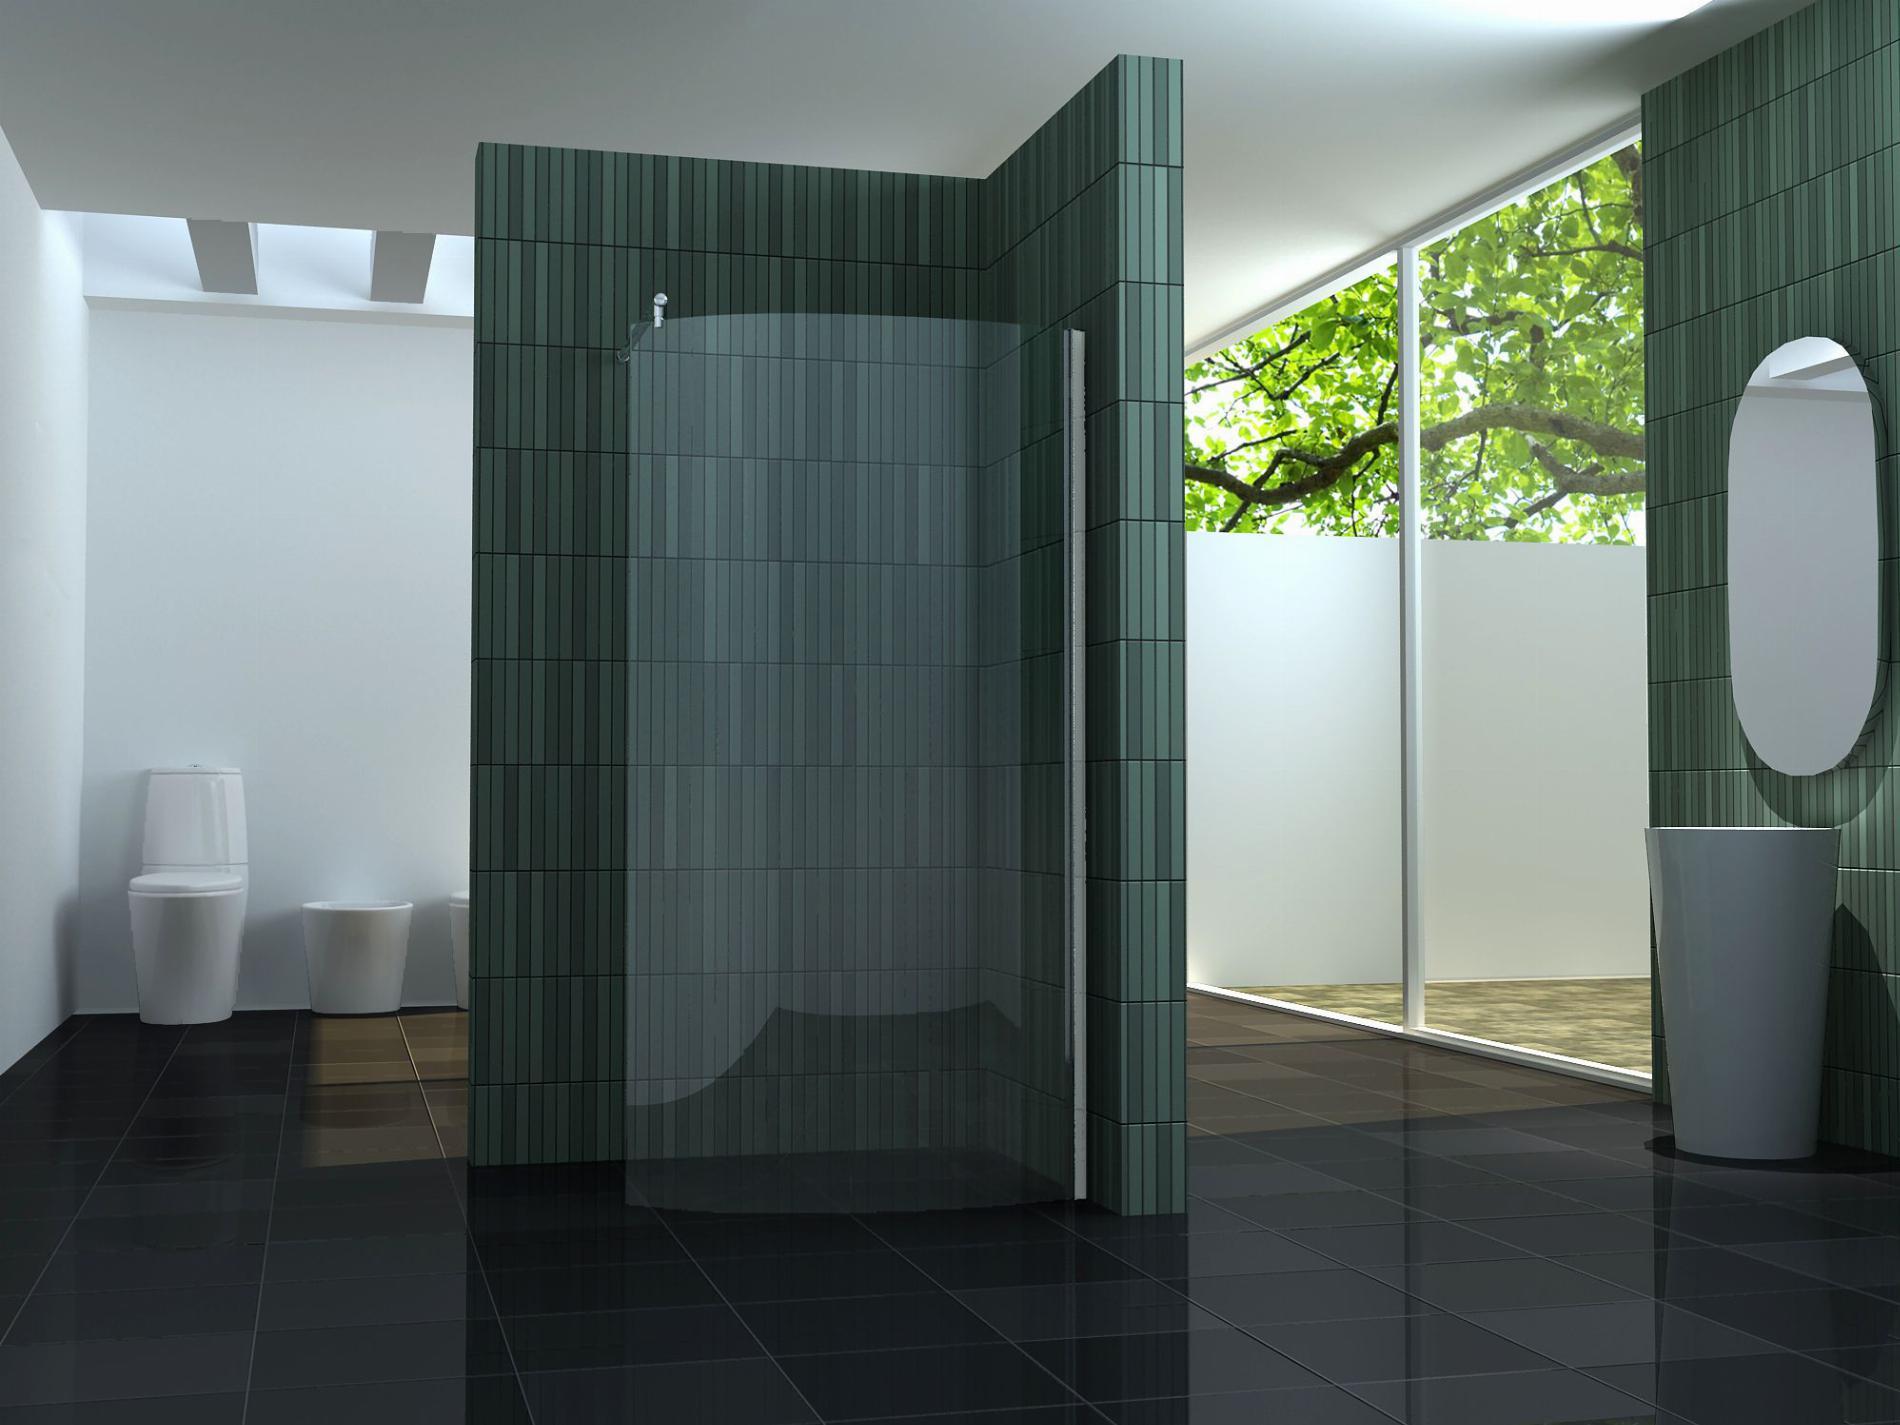 gebogene 8 mm Duschtrennwand FREE-SWING 120 x 200 cm